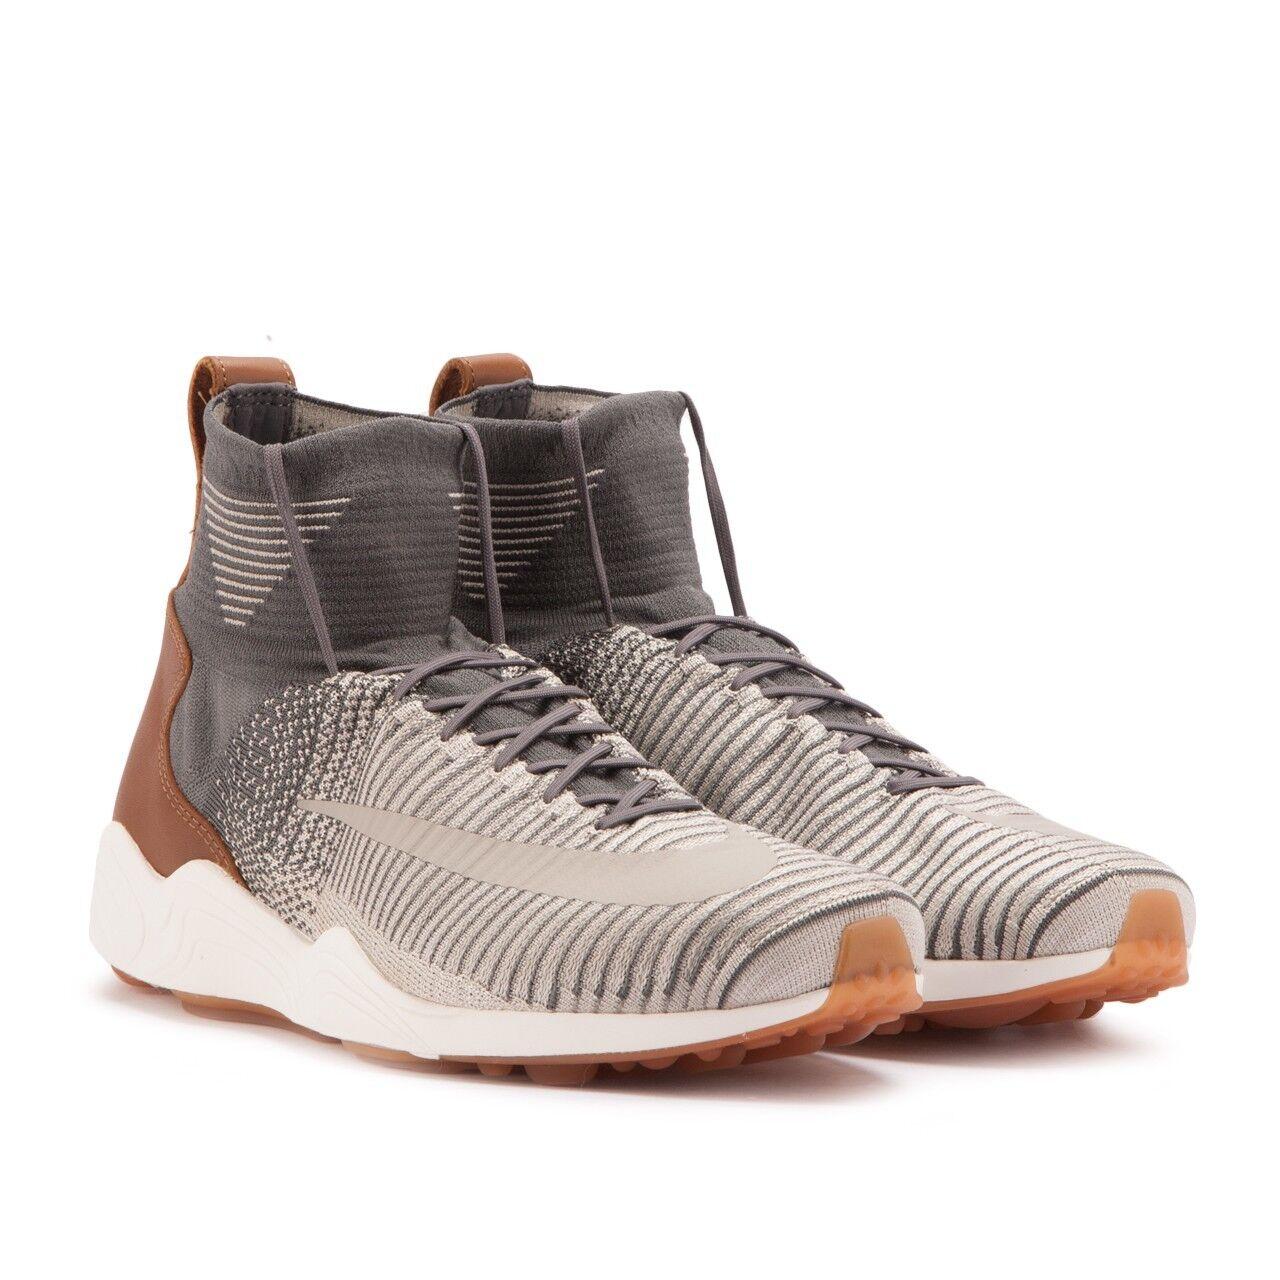 Nike Zoom Mercurial XI FK Casual Shoe Mens SZ 9 Dark Grey Pale Grey 844626 003